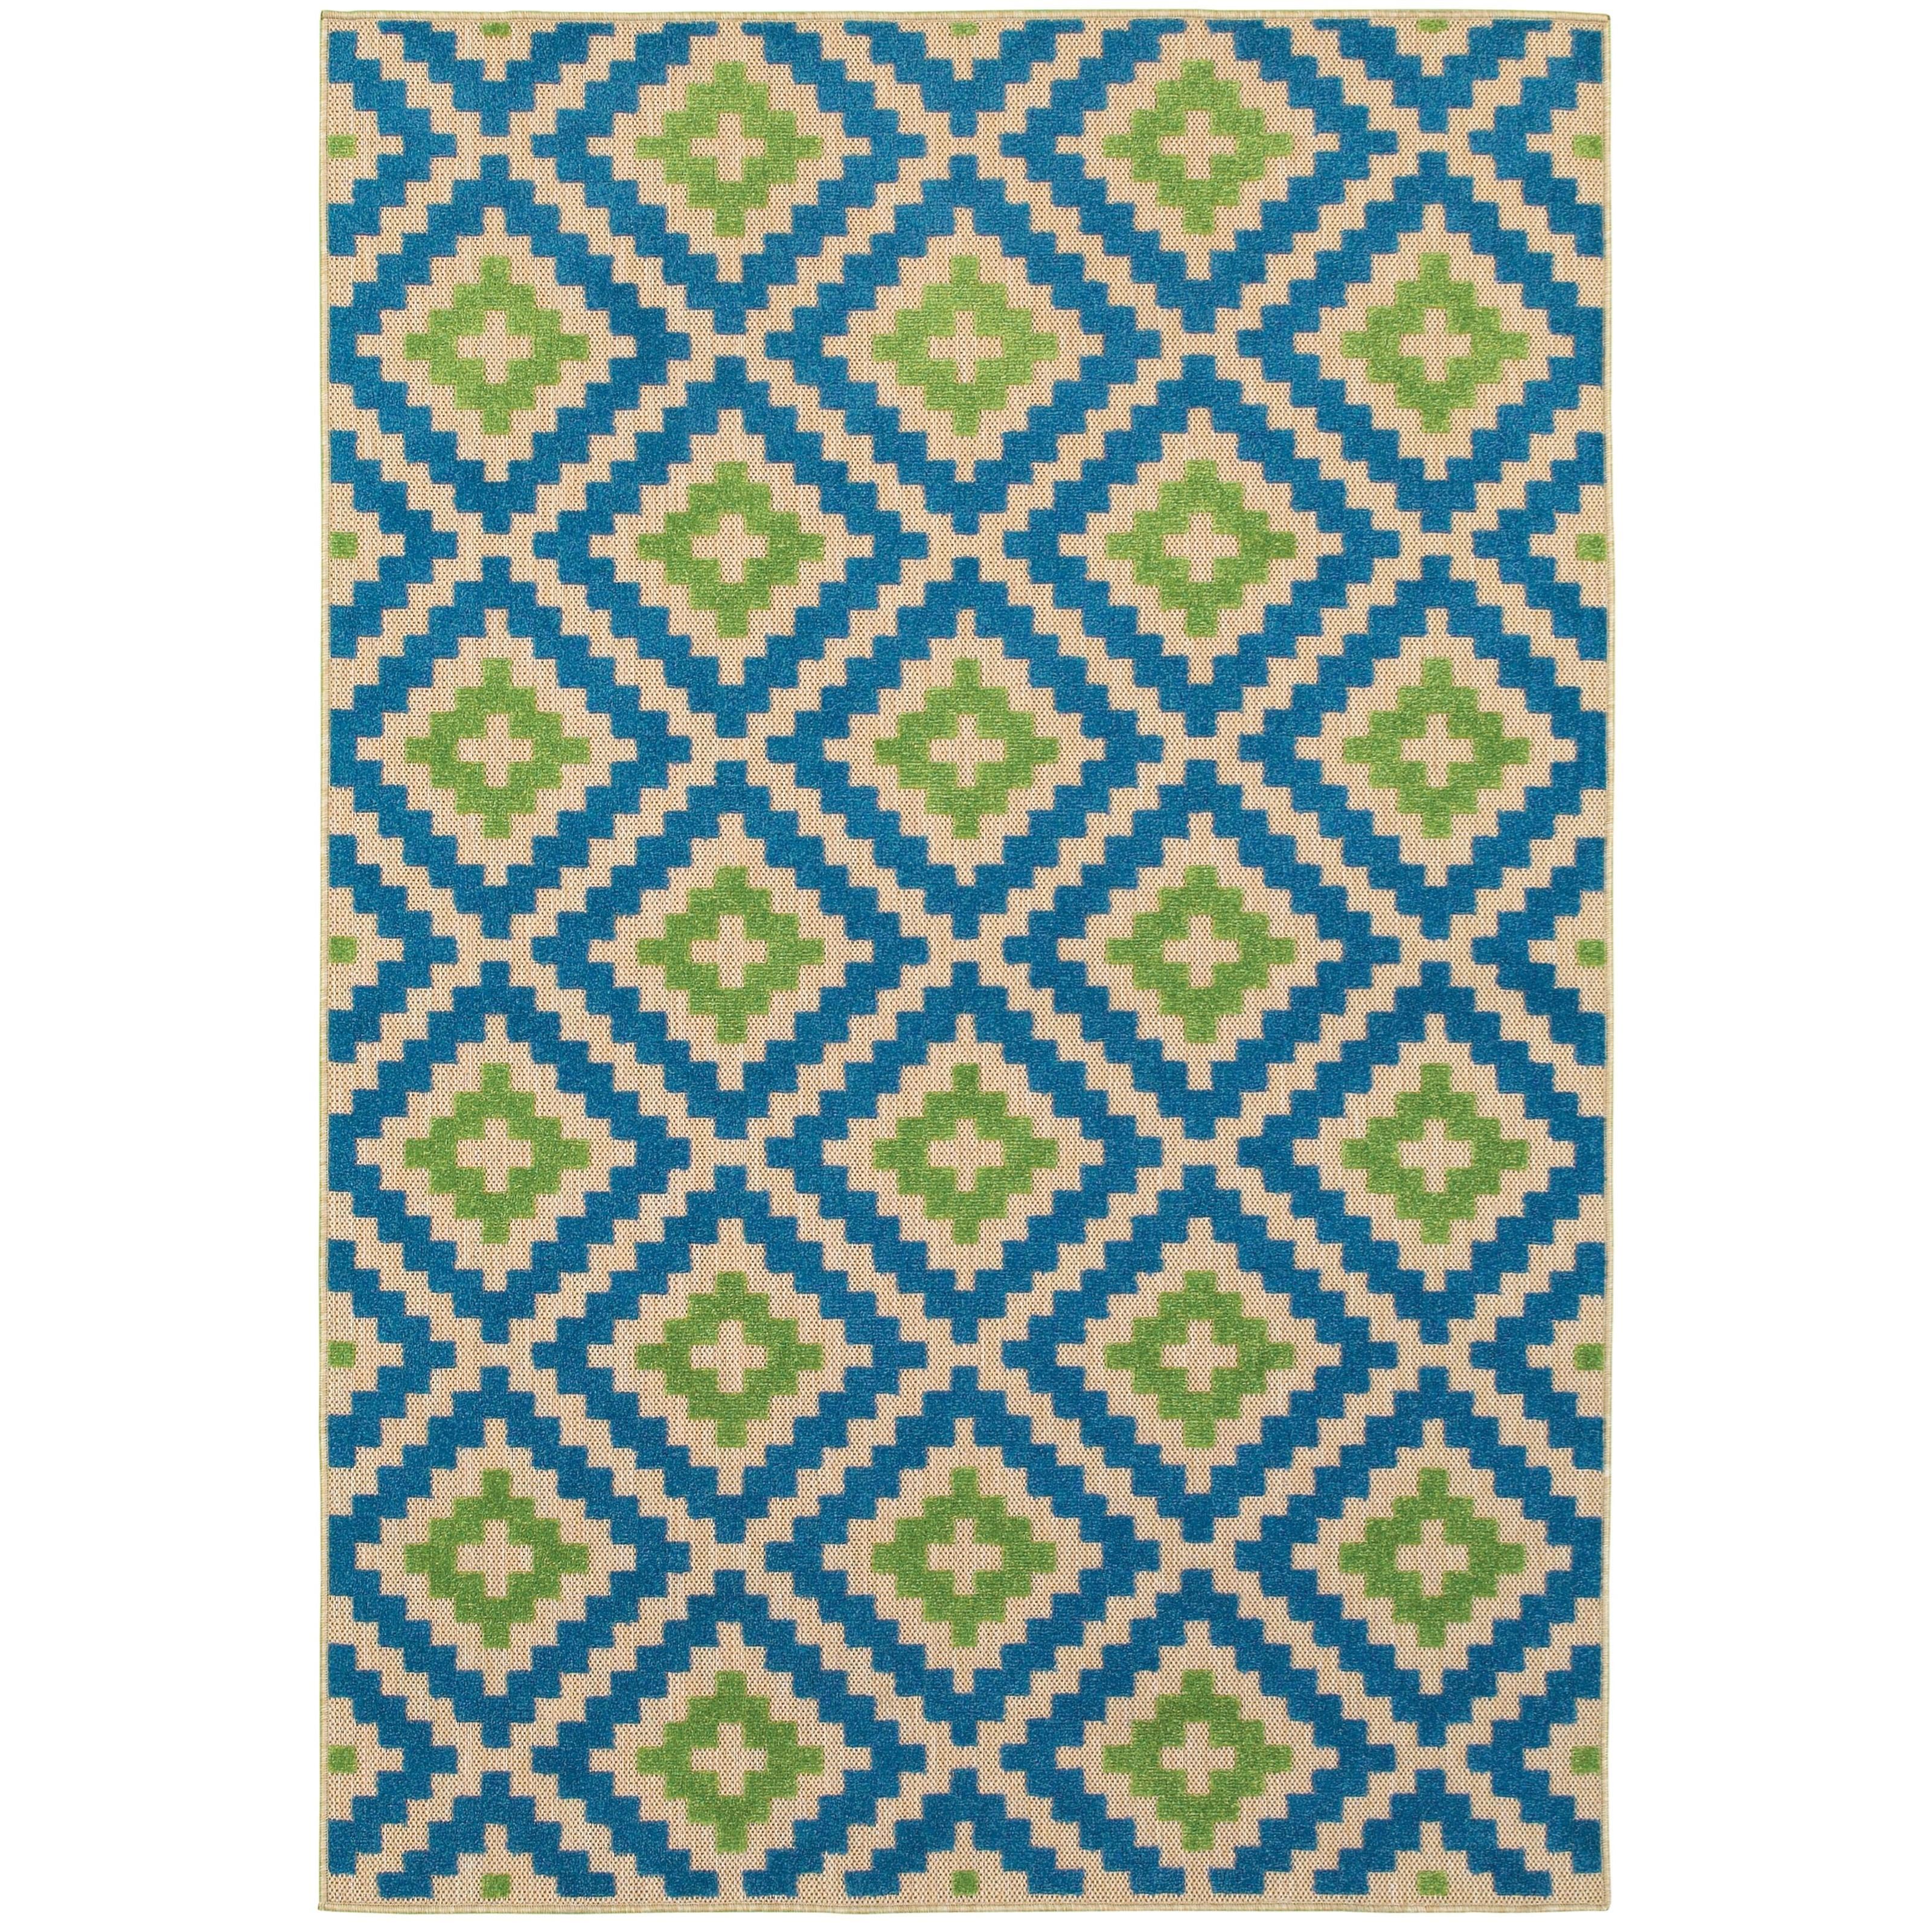 "Cayman 7'10"" X 10'10"" Outdoor Sand/ Blue Rectangle  by Oriental Weavers at Lucas Furniture & Mattress"